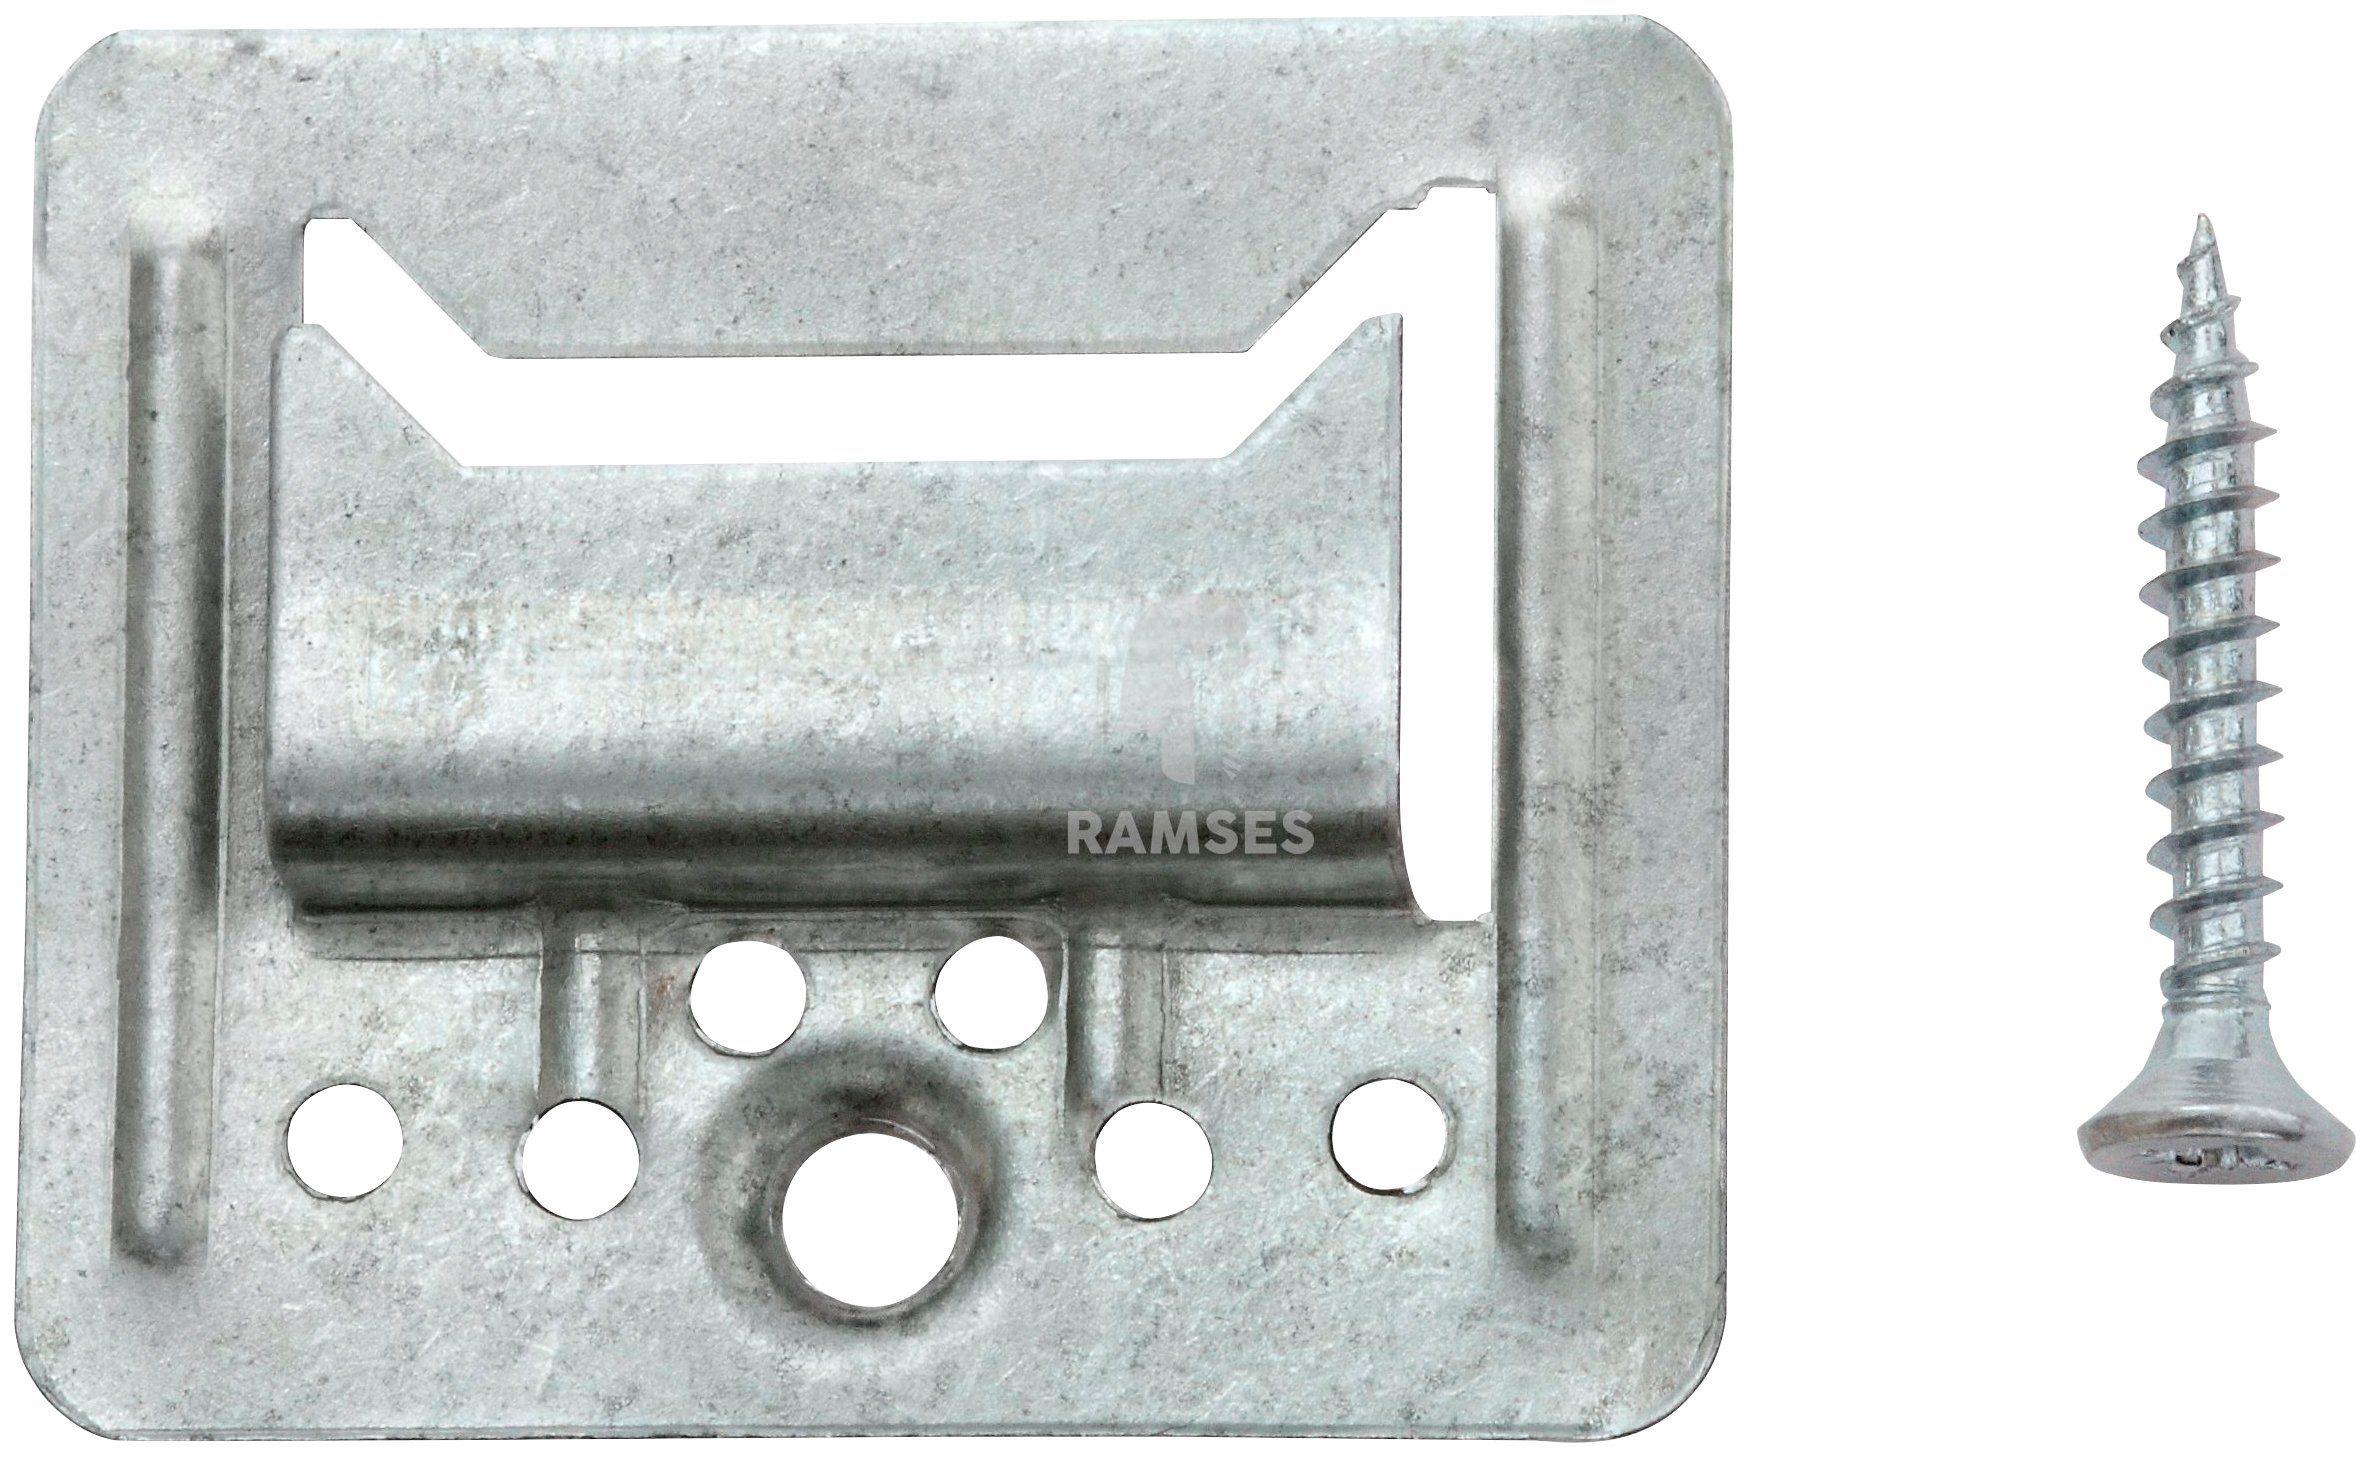 RAMSES Profilholzkrallen , extra stark inkl. Schrauben 3 mm Stahl verzinkt 100 Stück